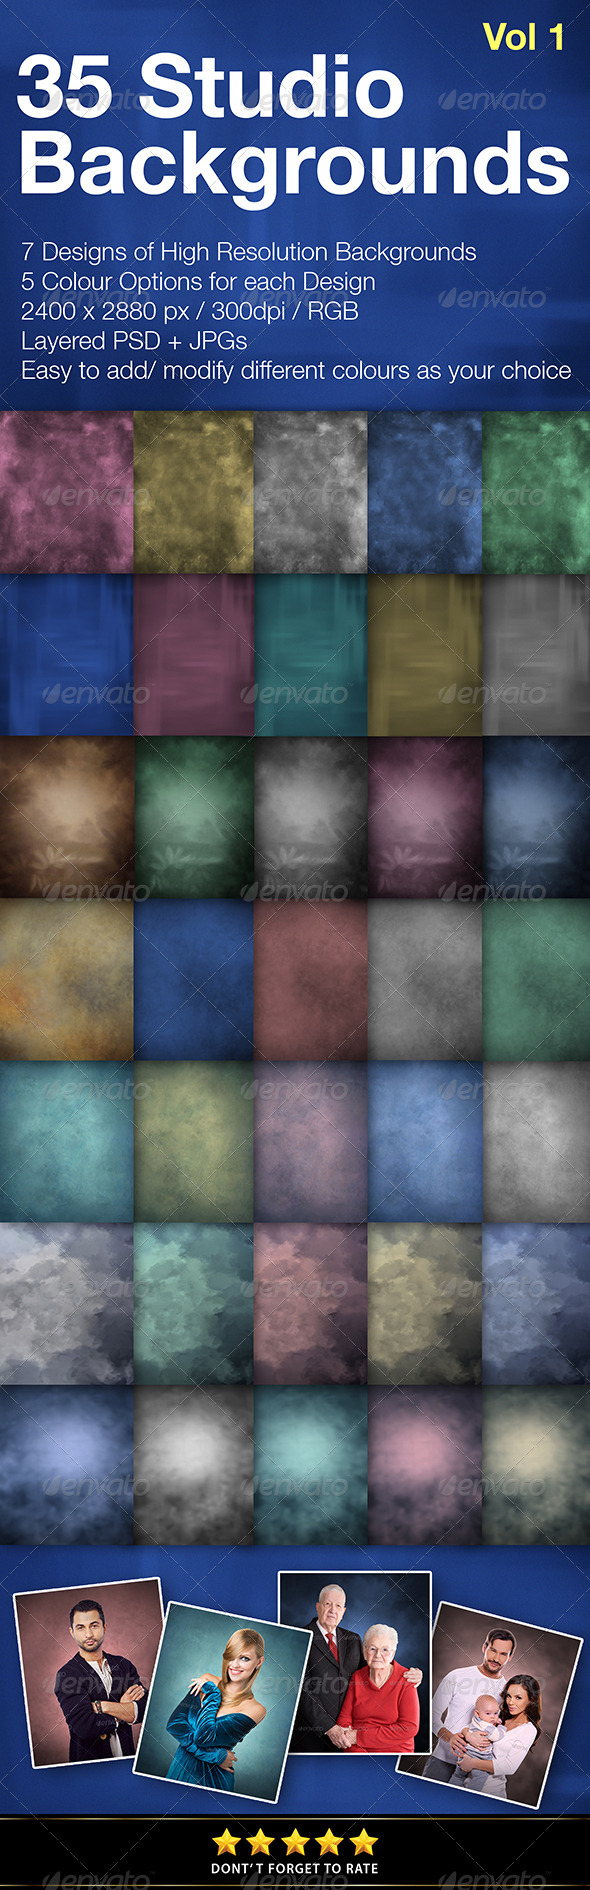 35 Studio Backgrounds